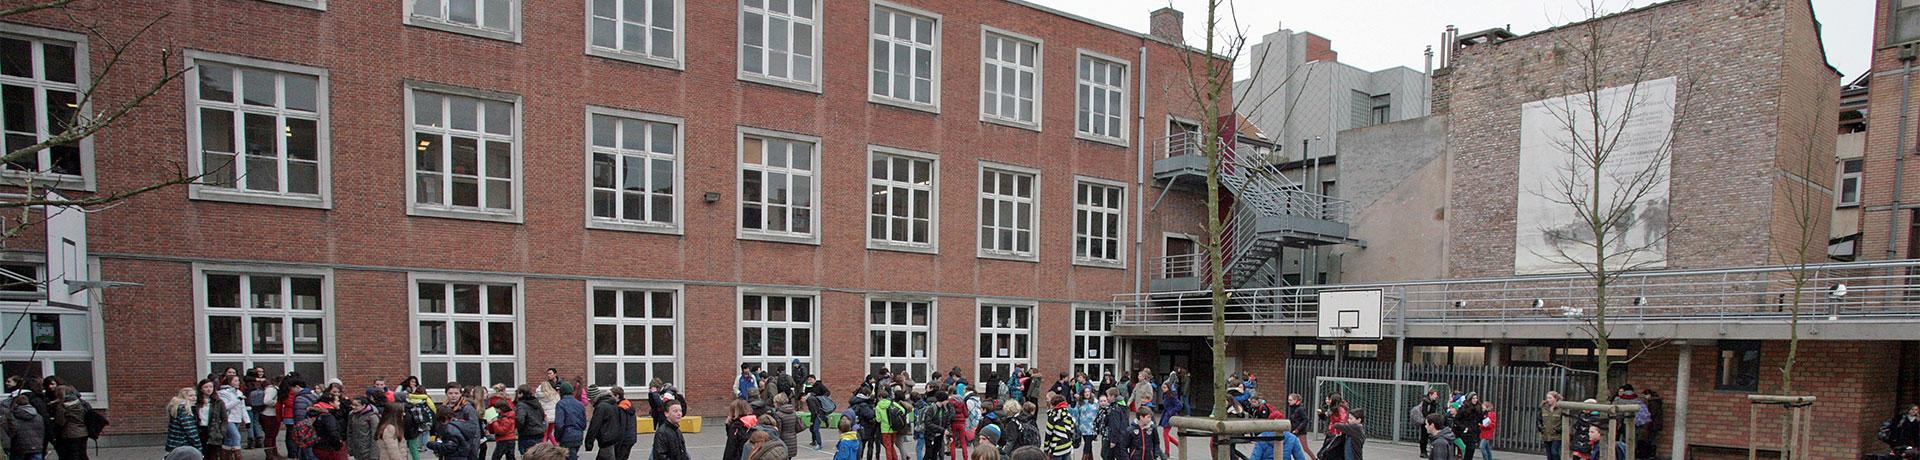 College Petrus En Paulus Historiek Header